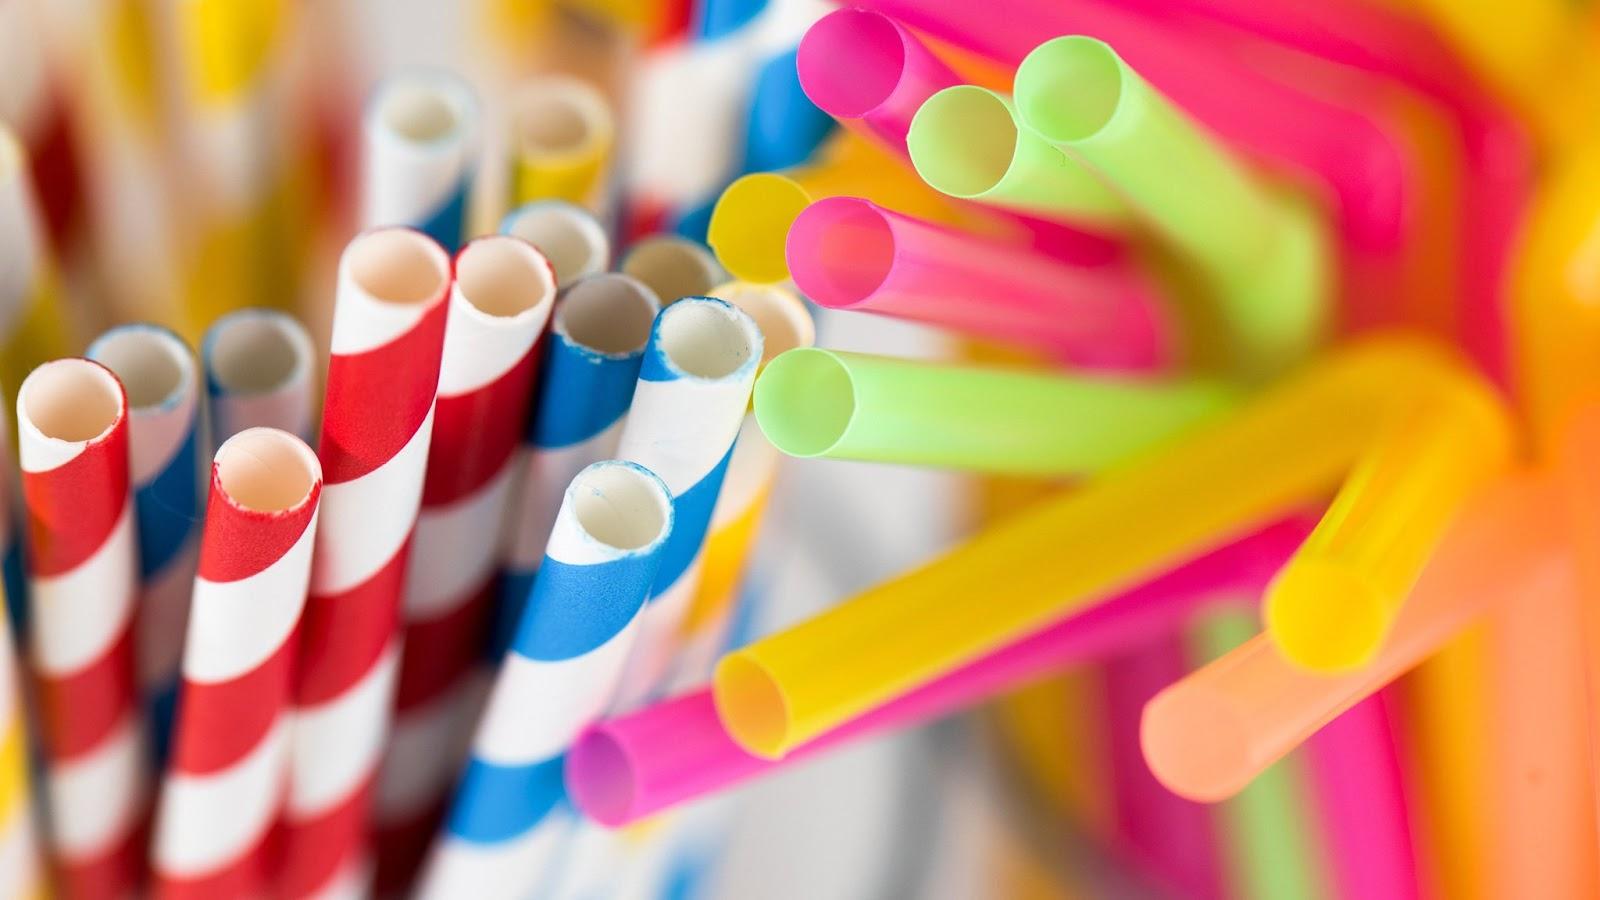 Plastic Straw Waste